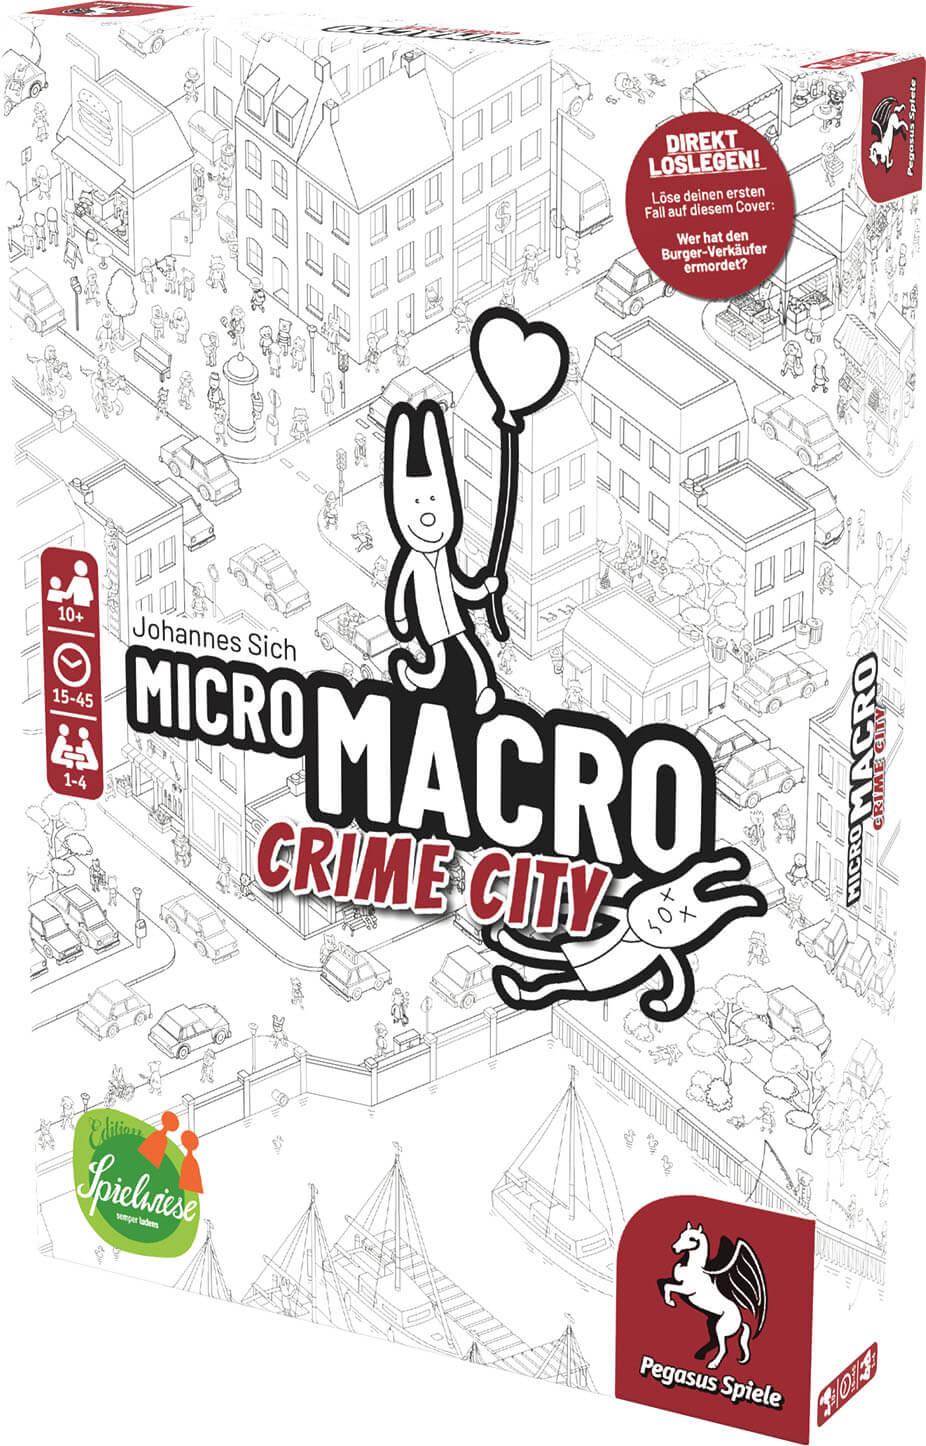 Schachtel Vorderseite, rechte Seite- MicroMacro: Crime City